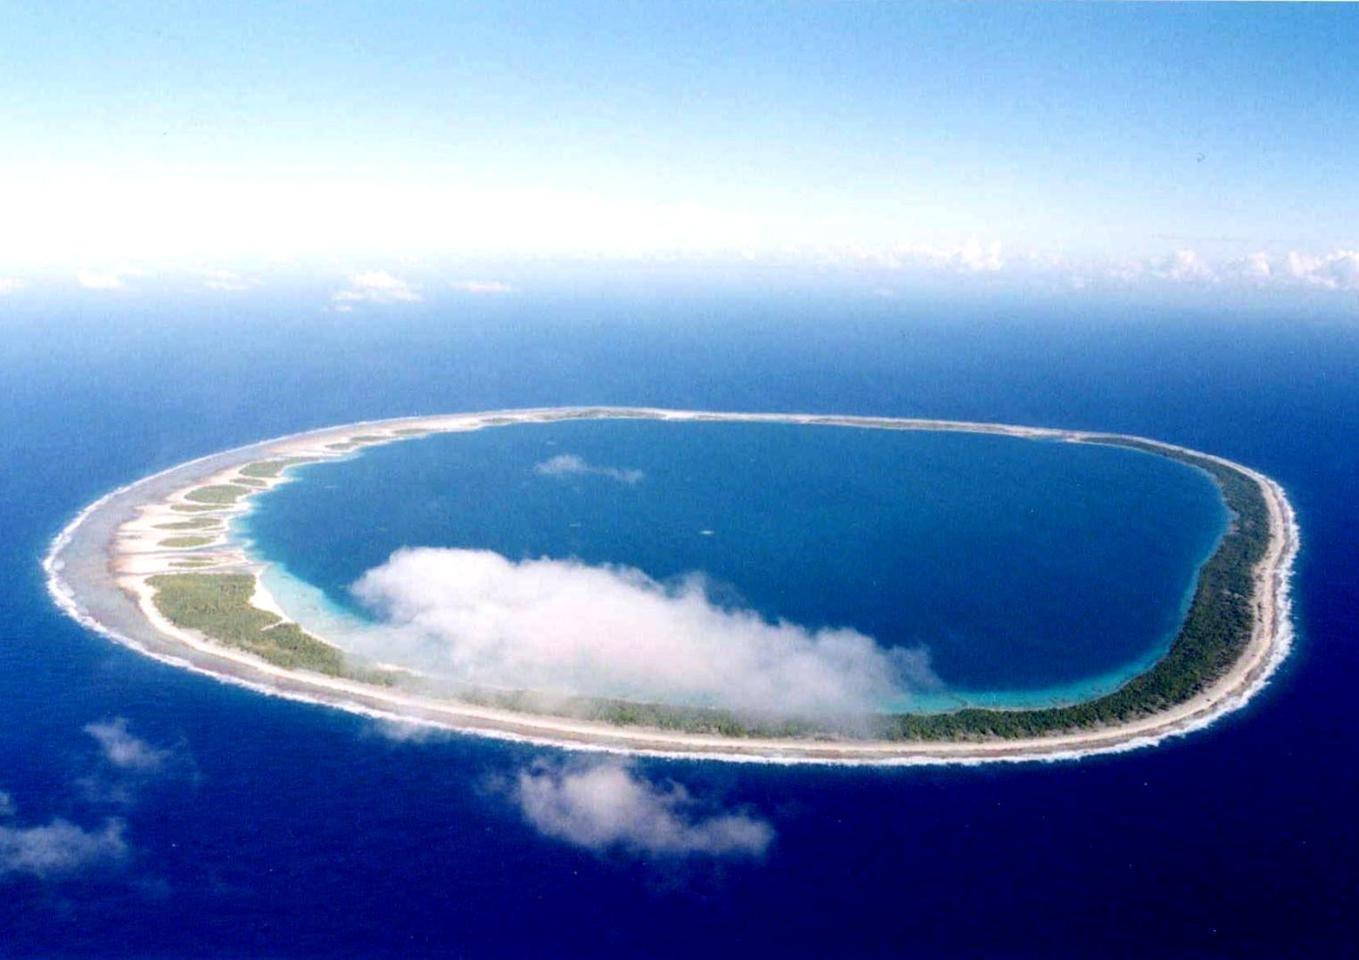 Land in Tuamotu Archipelago, The Tuamotu and Gambier Islands, French Polynesia 1